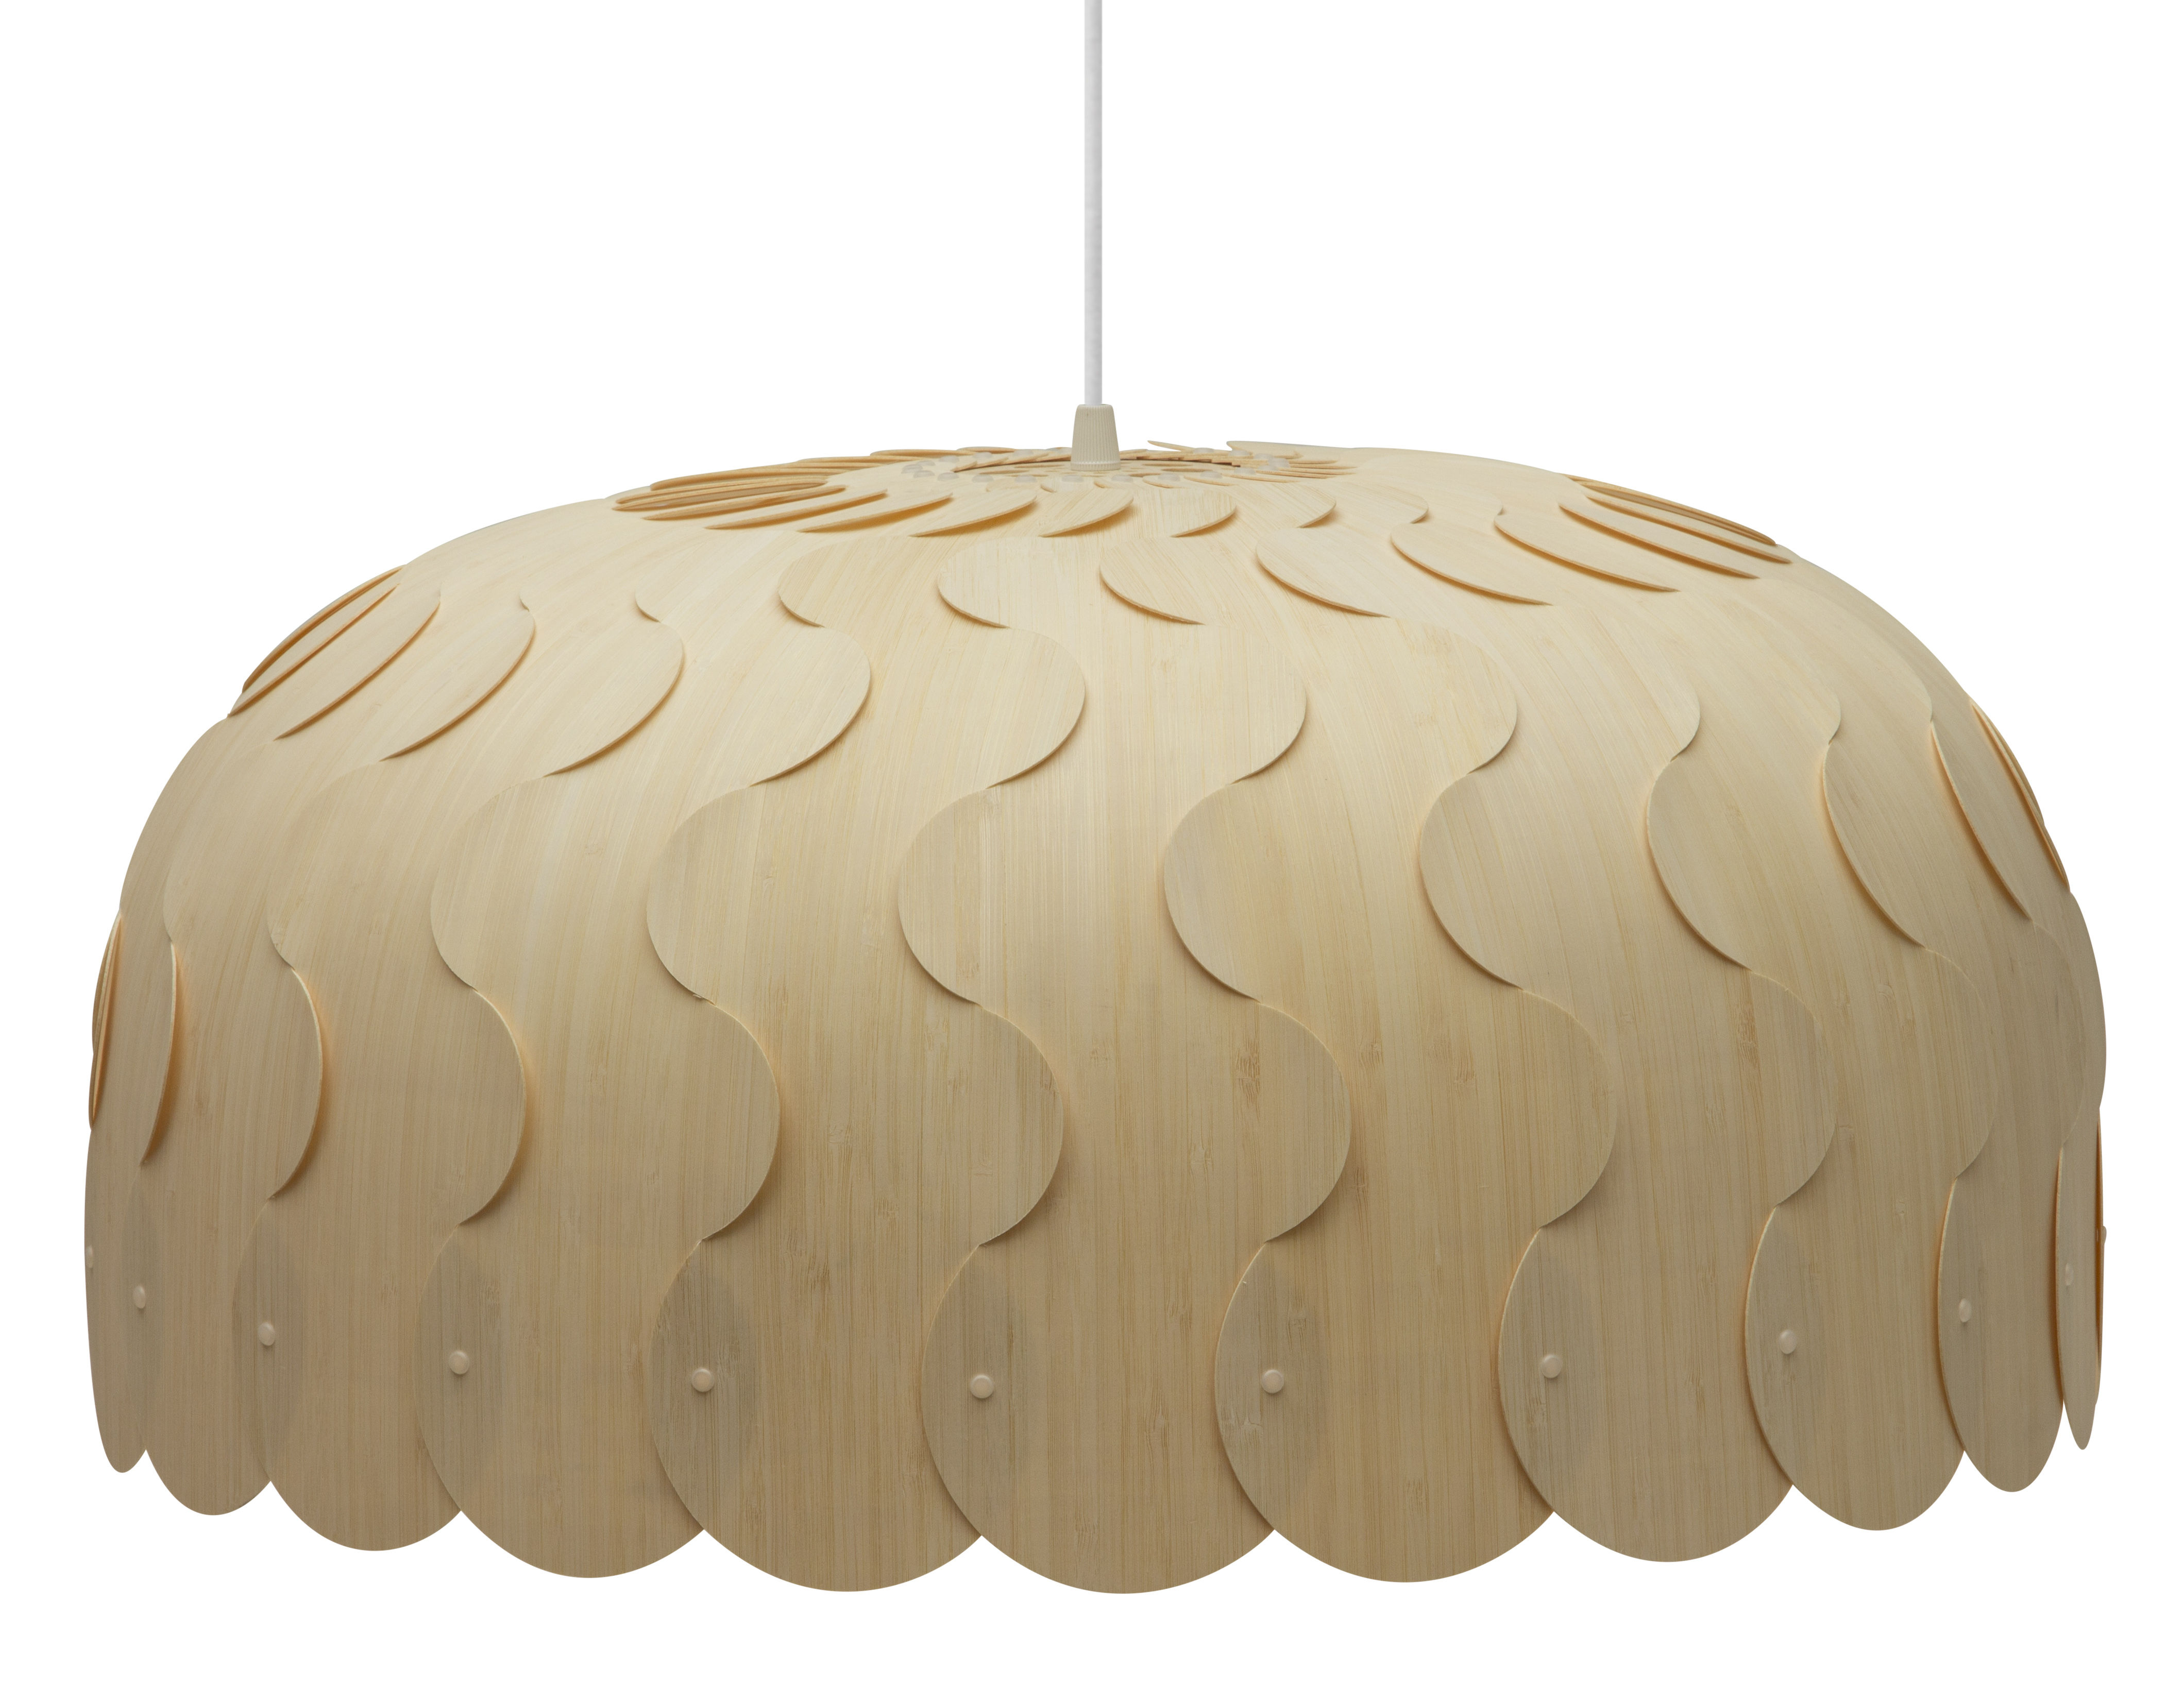 Illuminazione - Lampadari - Sospensione Beau / Large - Ø 75 cm - David Trubridge - Large : Ø 75 cm - Bambù, Nylon